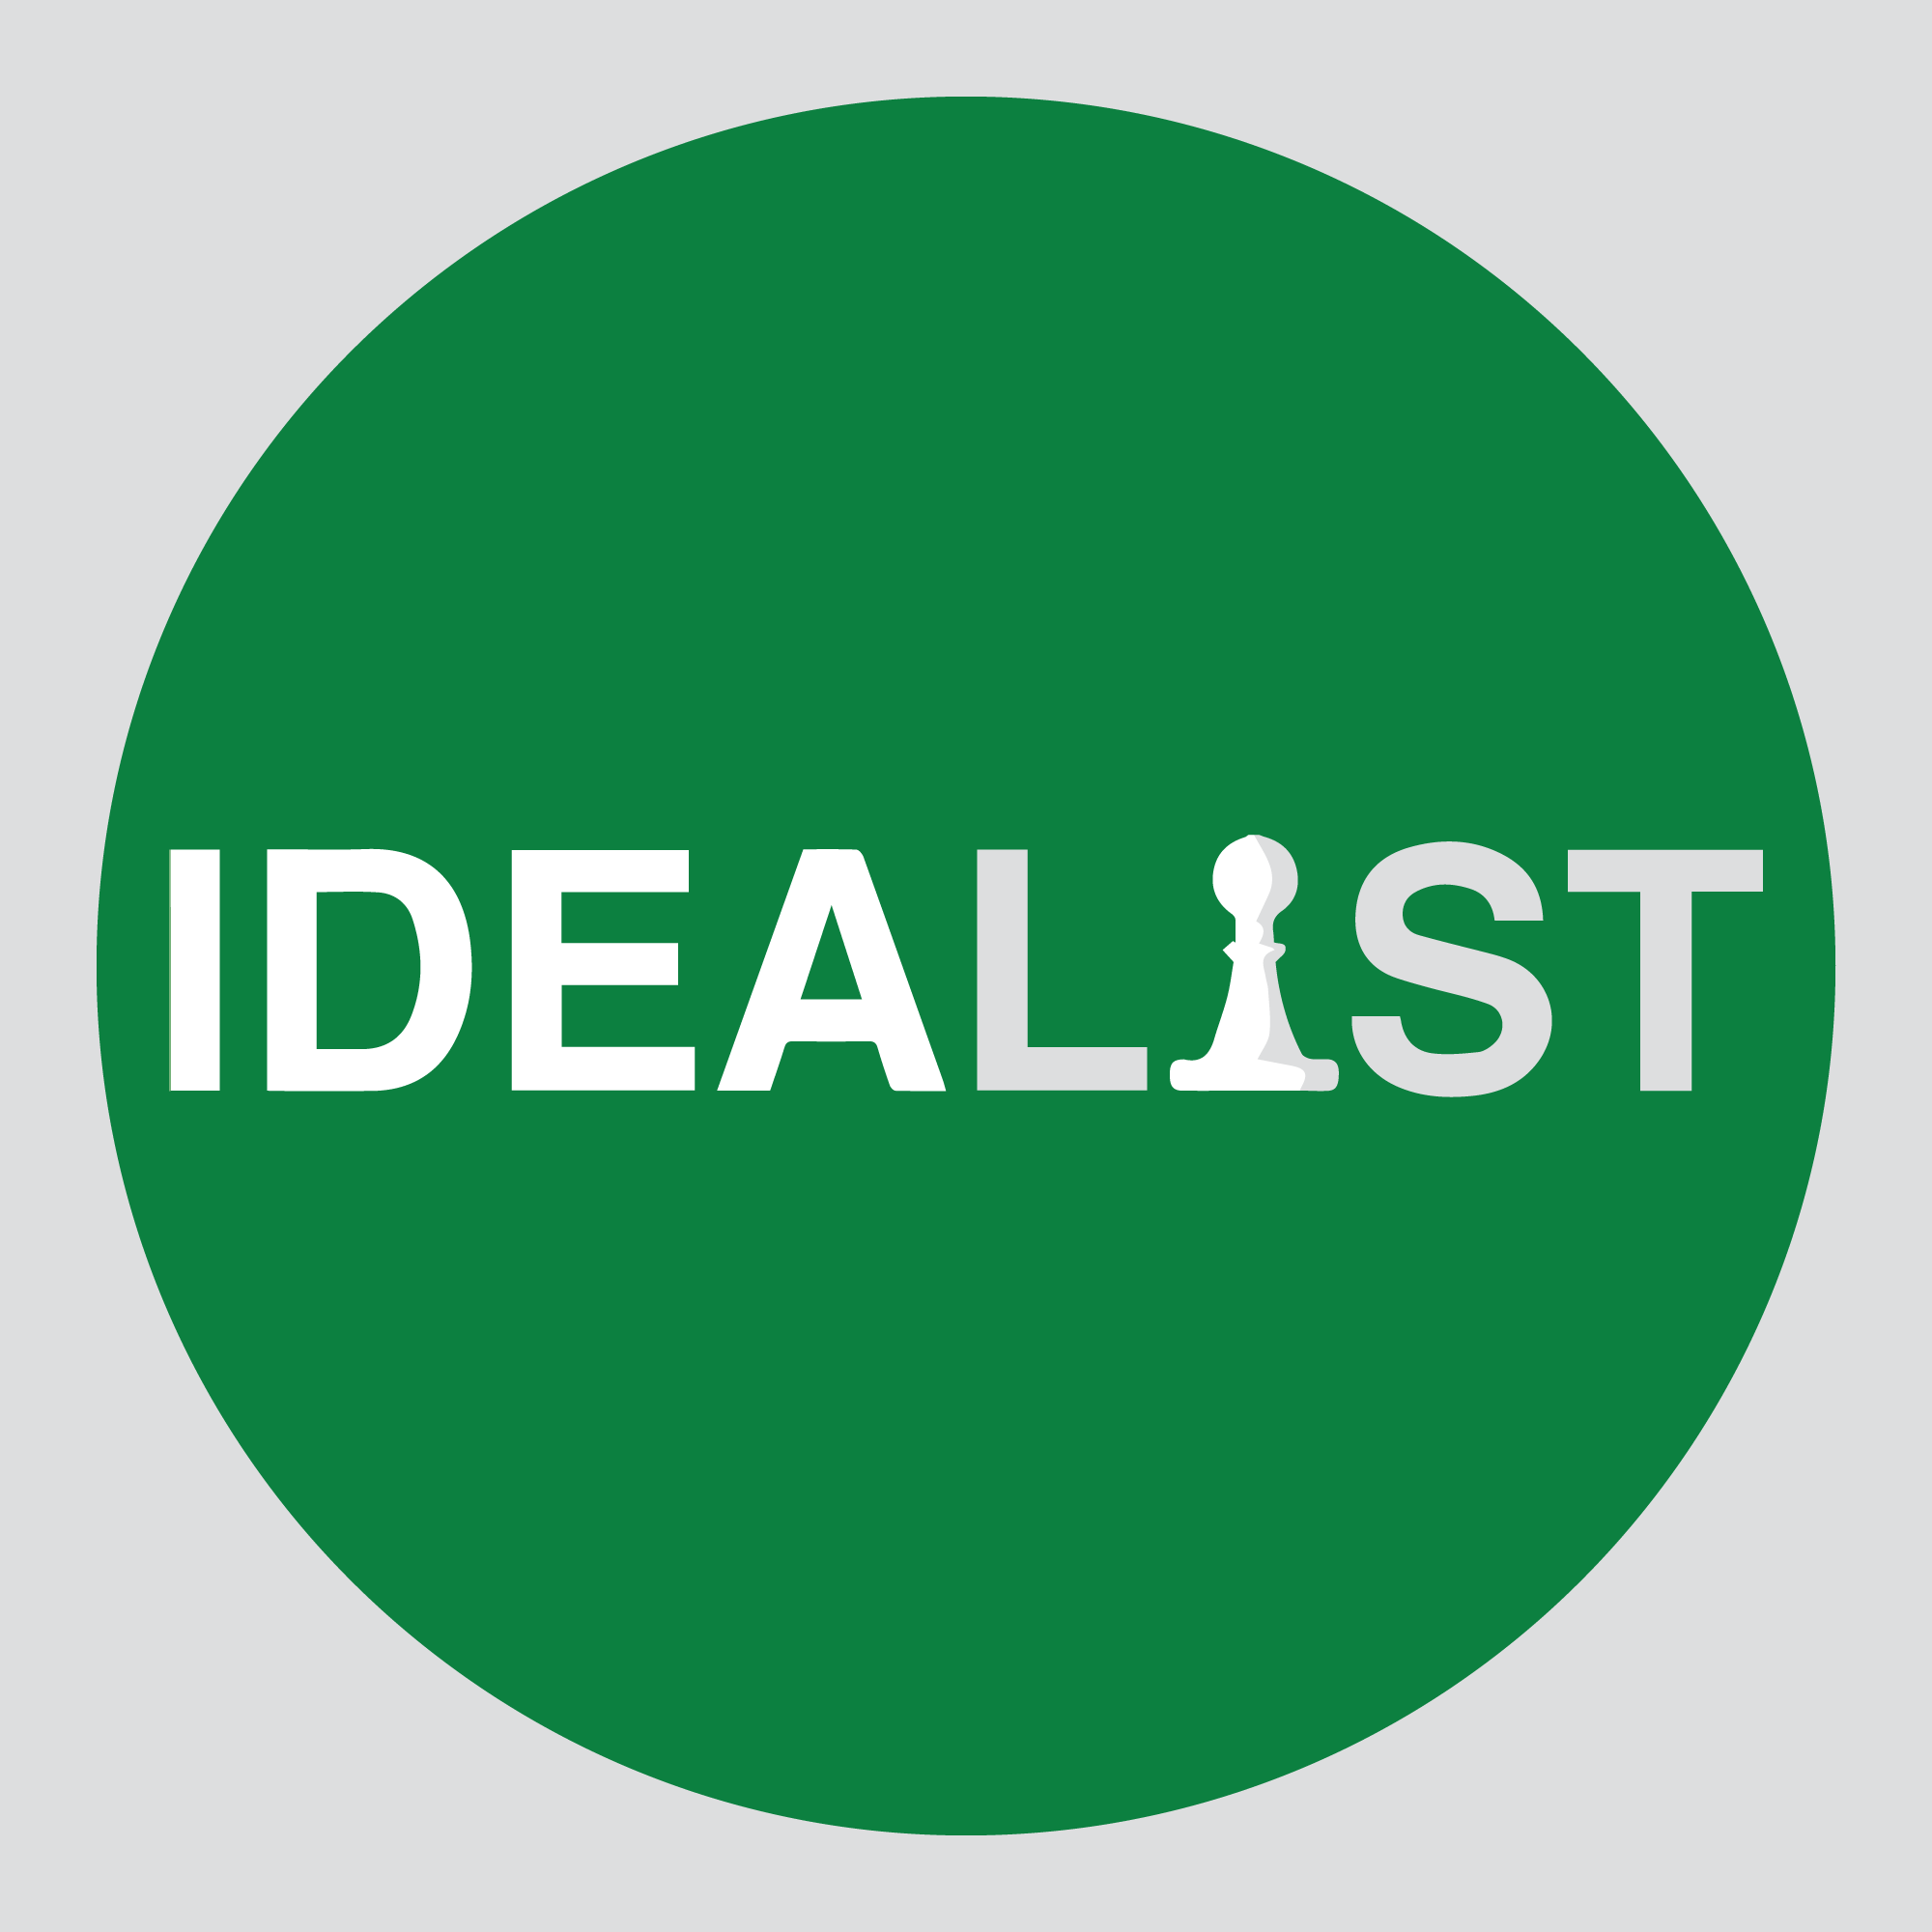 idealist-logo-featured-image